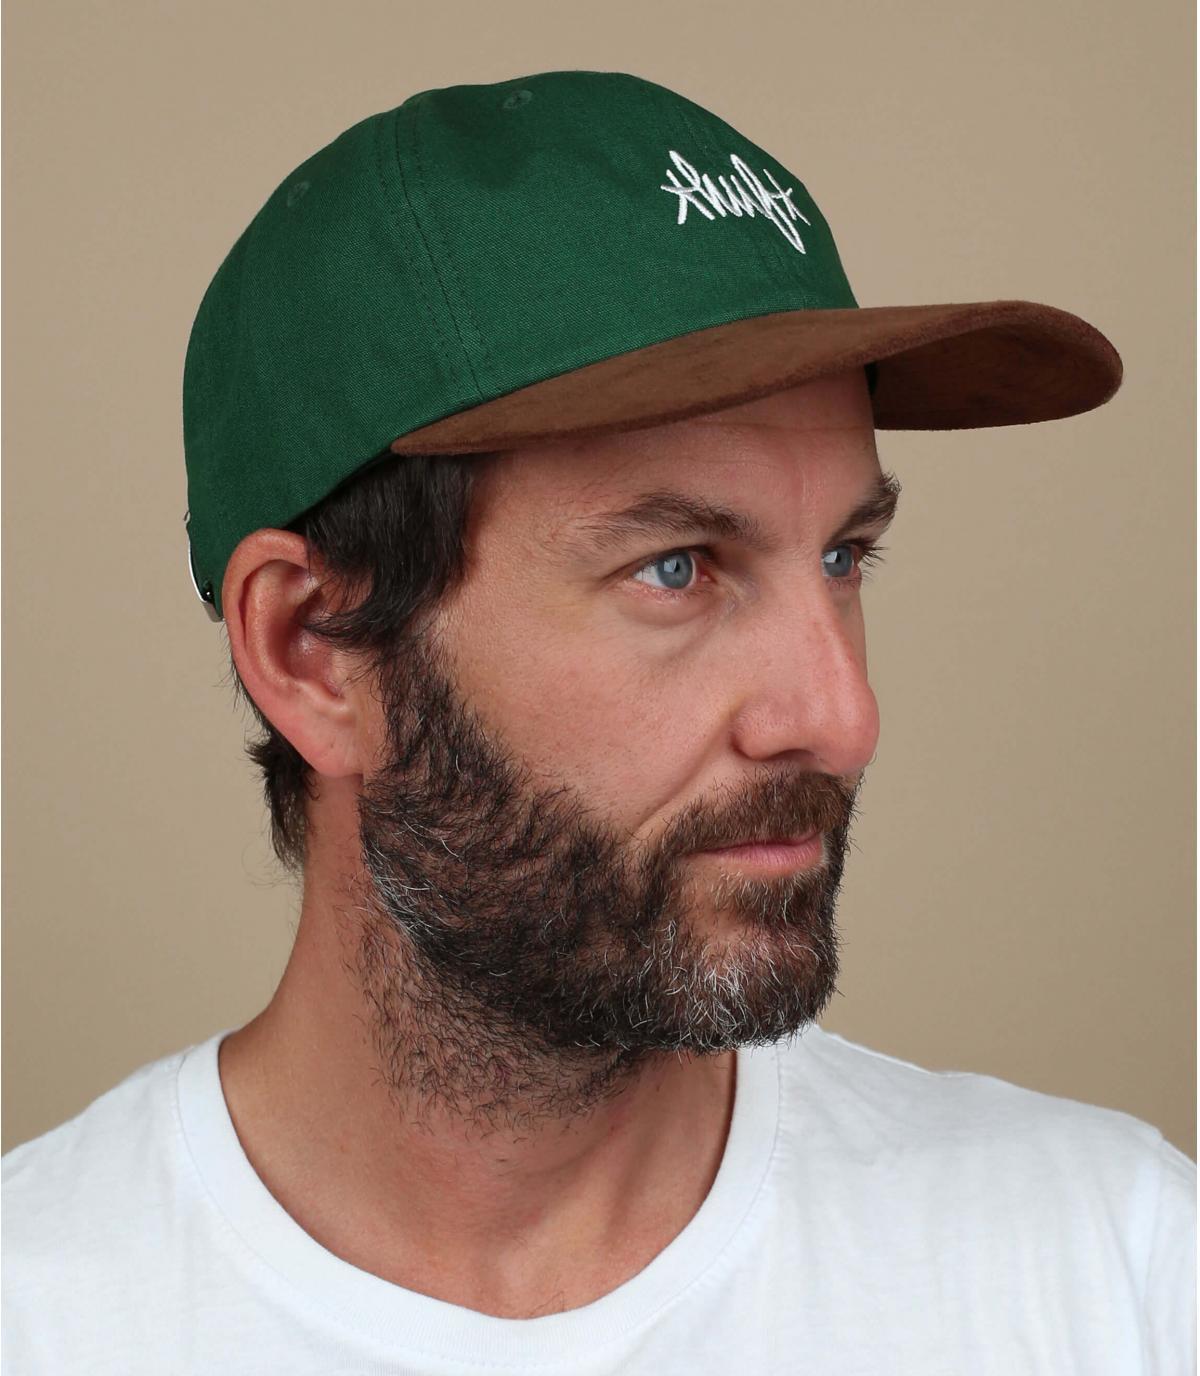 Cappellino Huf in camoscio verde